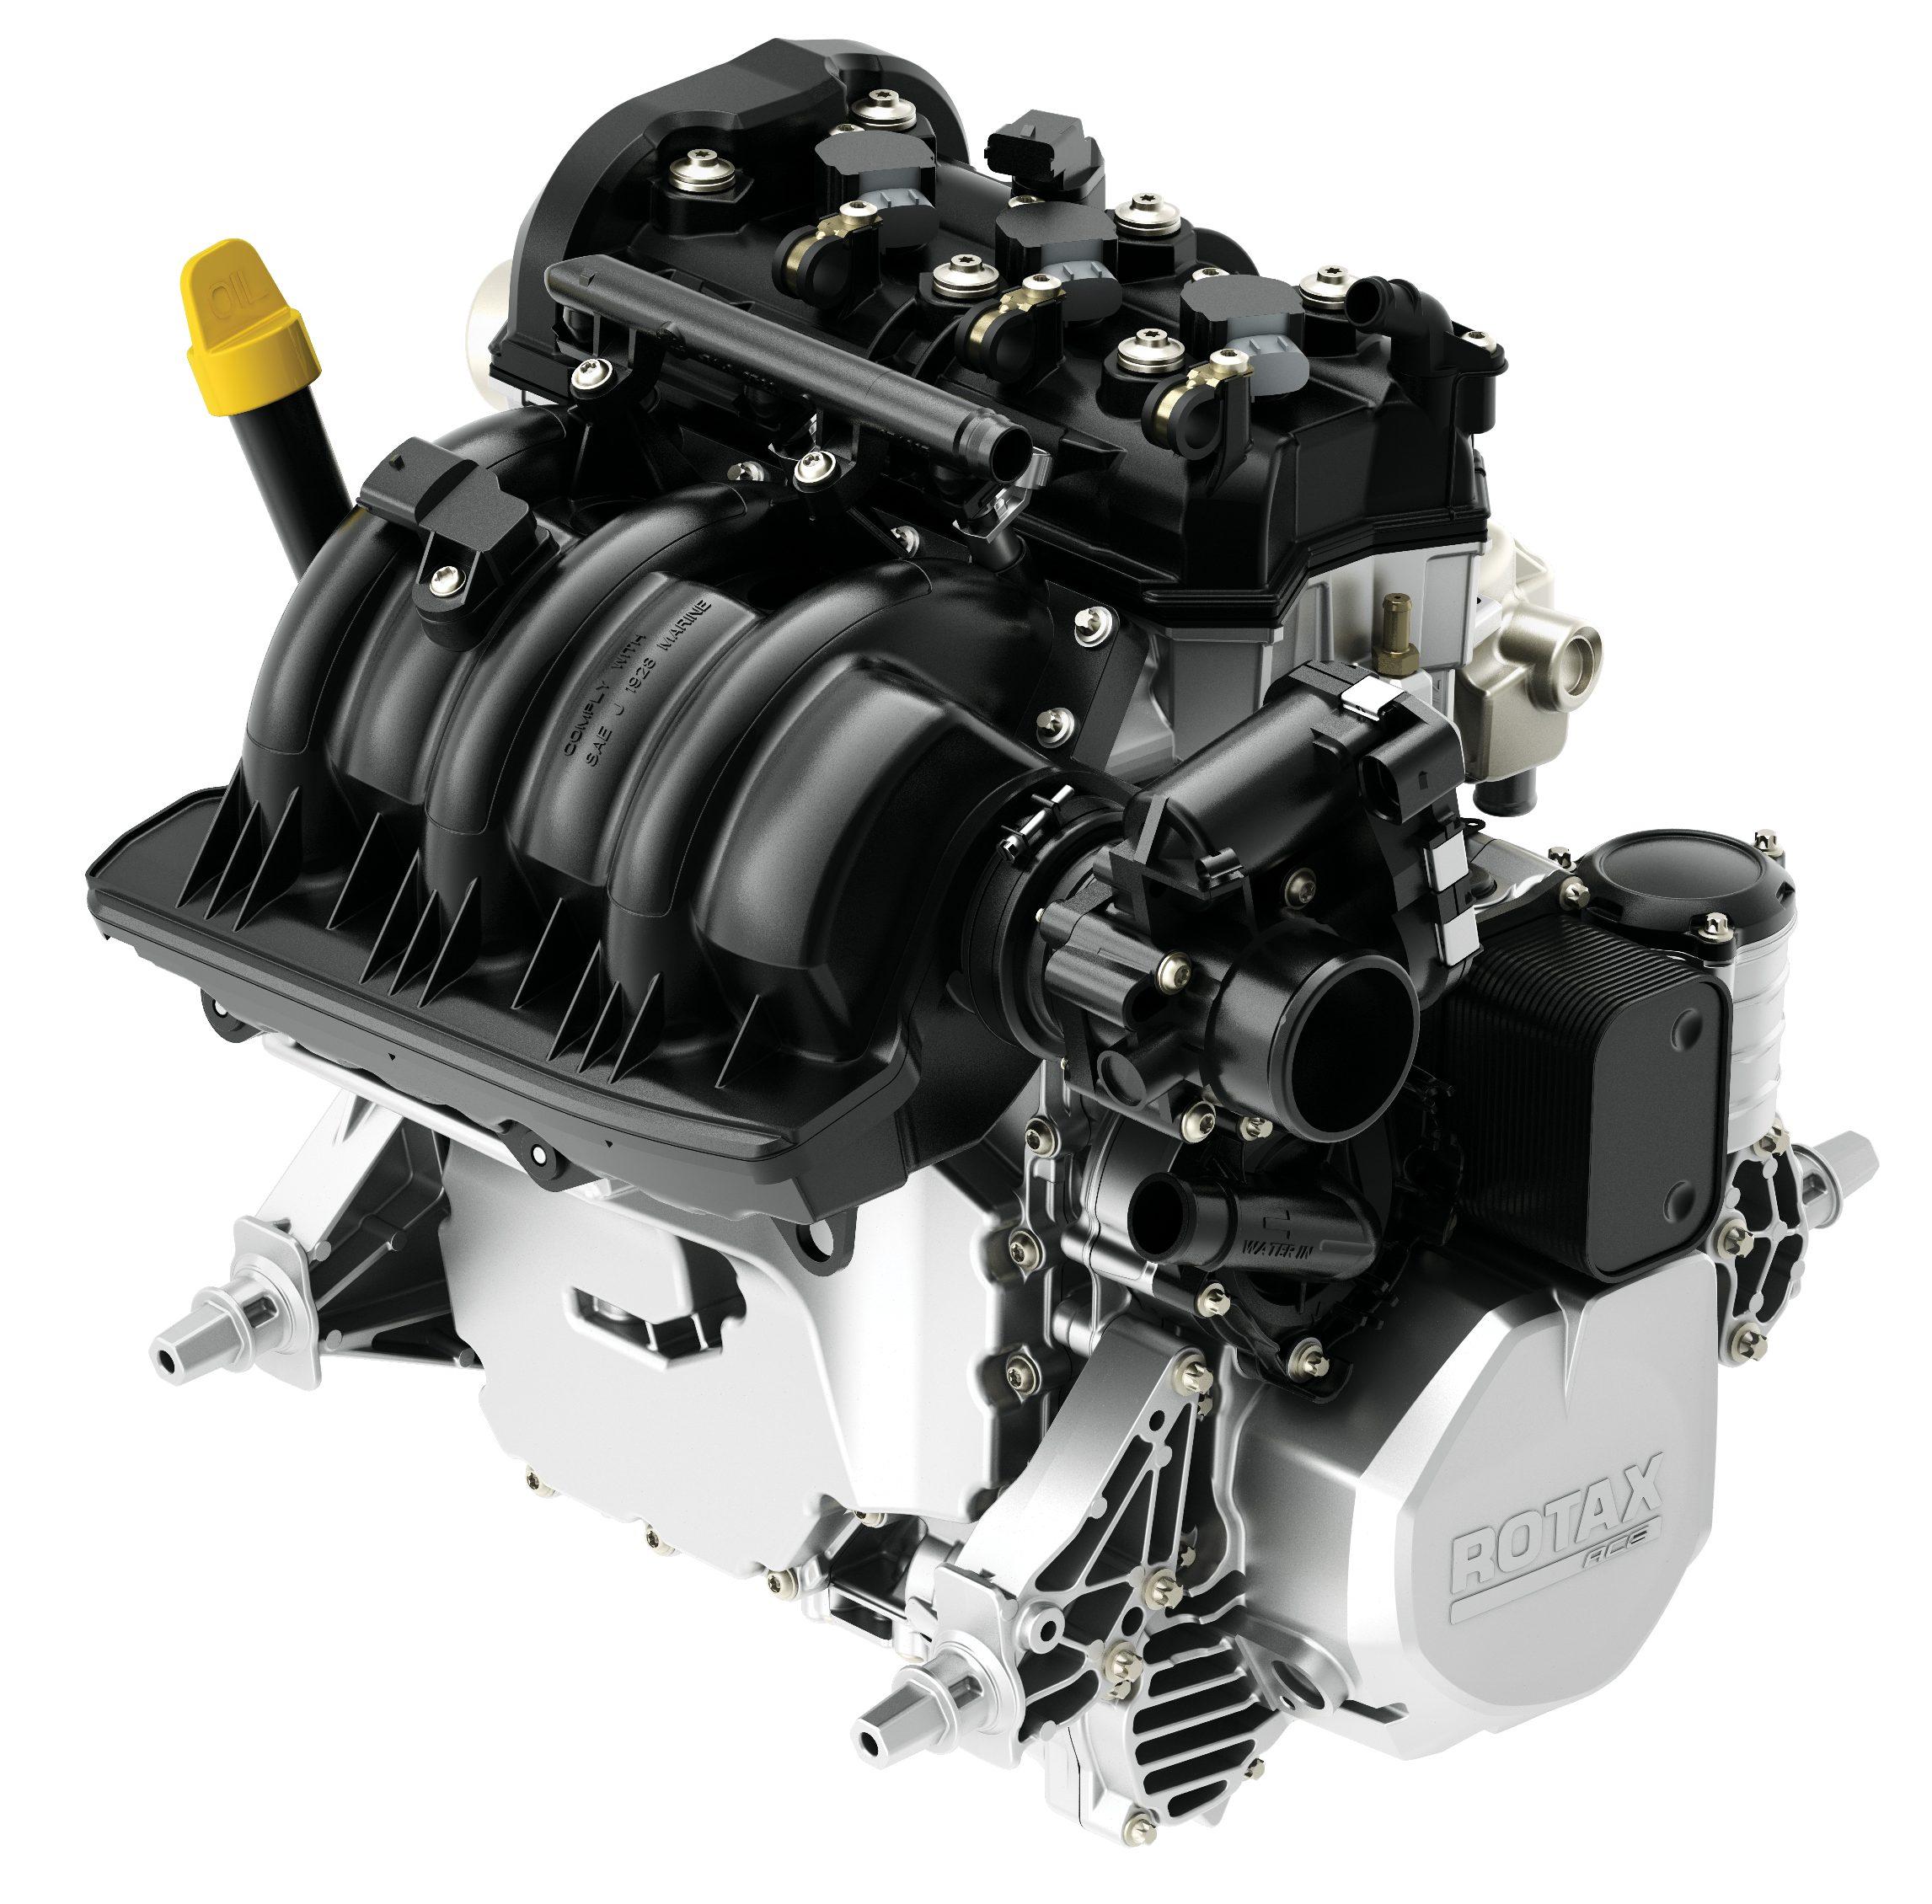 Sea Doo Engine